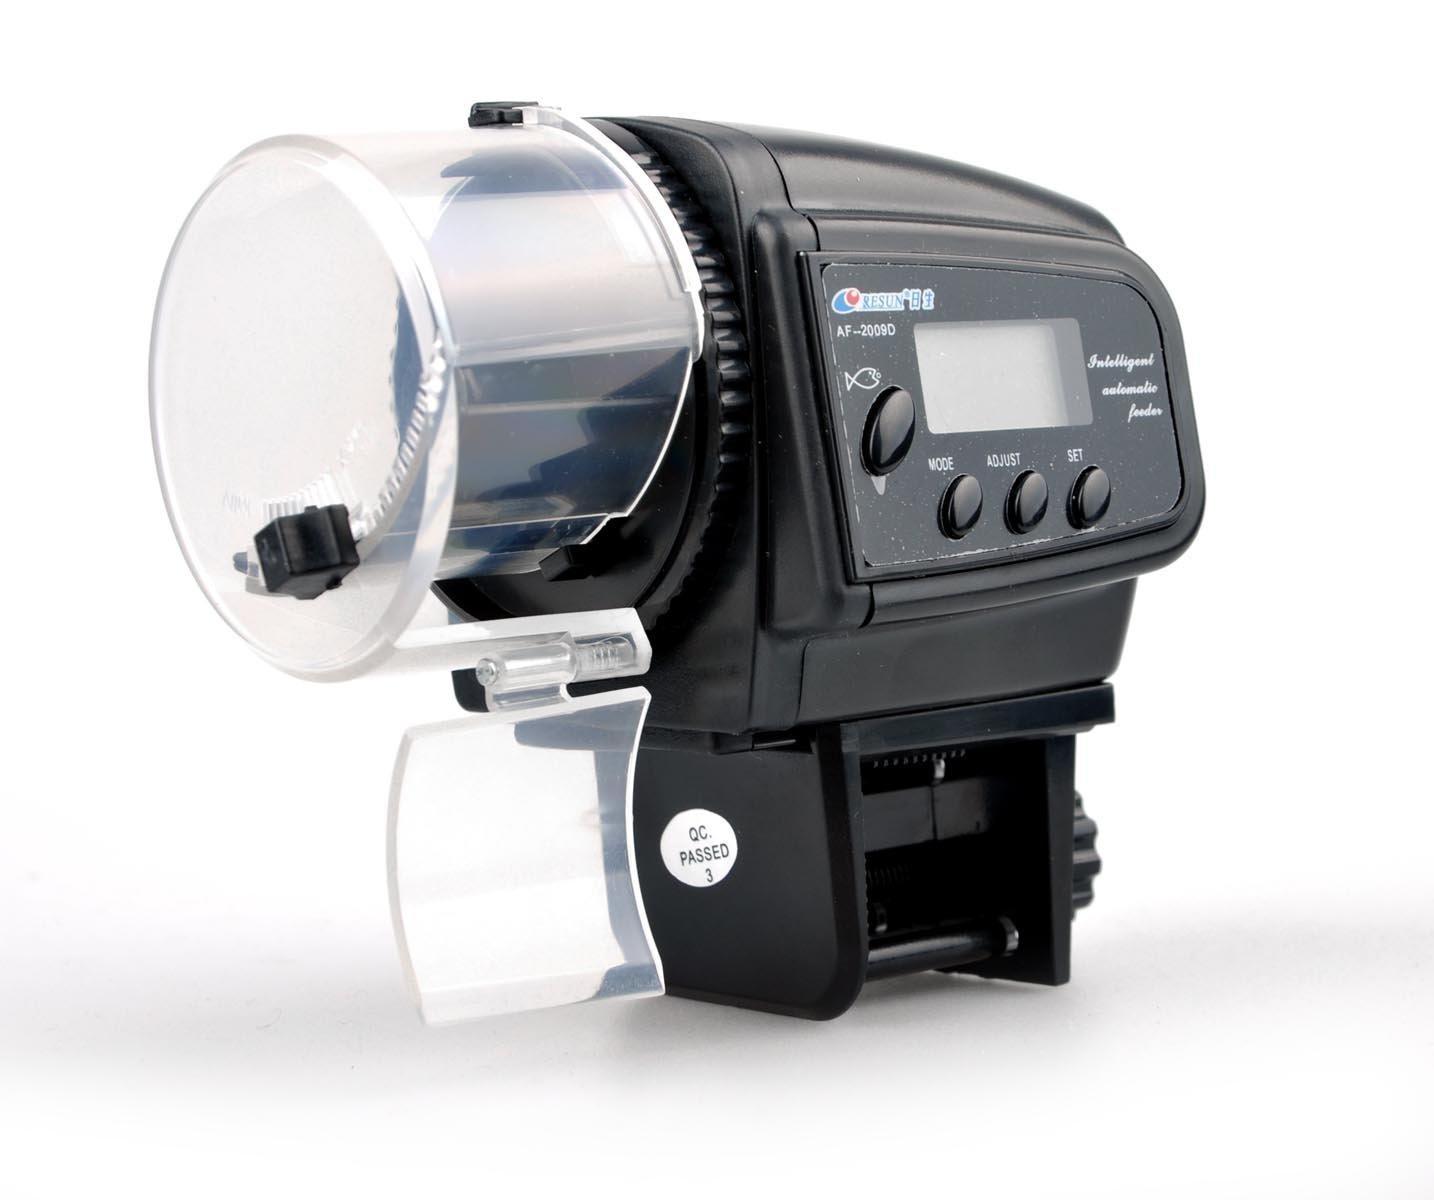 Fish tank feeder - Klaren Digital Automatic Fish Feeder Aquarium Tank Pond